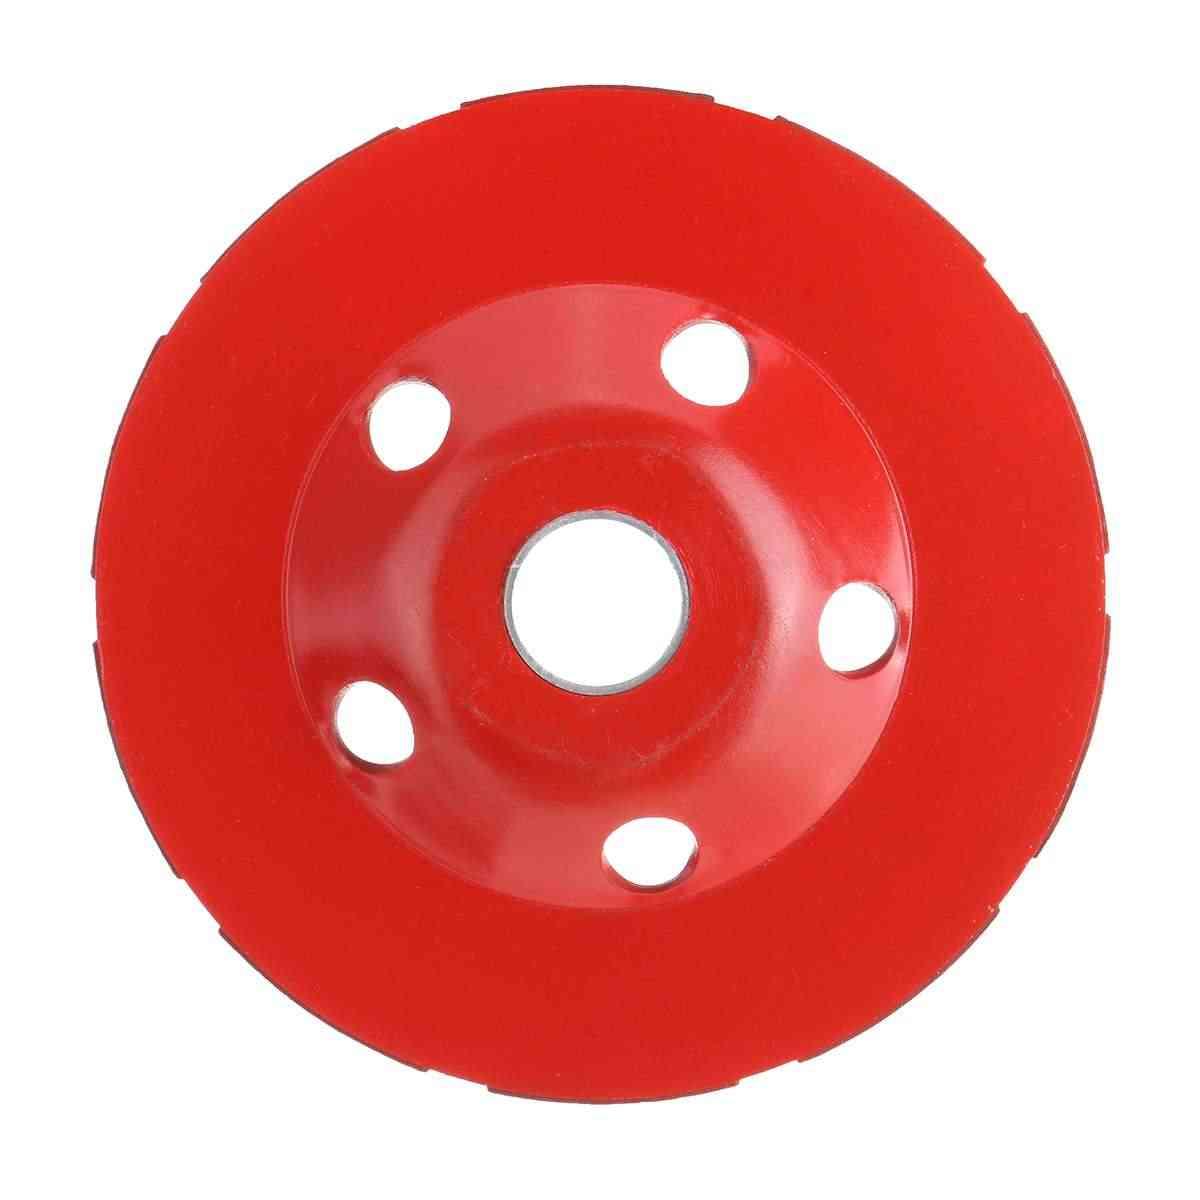 Doersupp Diamond Grinding Wheel Disc Bowl Shape Grinding Cup Angle Grinder Grinding Dust Shroud Concrete Granite Stone Ceramic